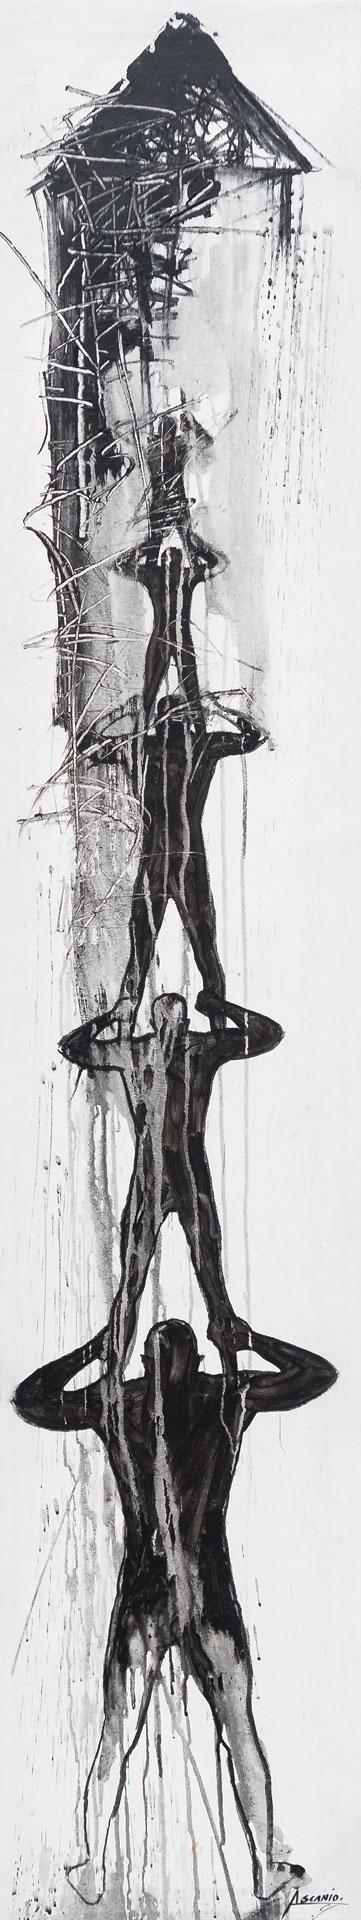 PLATFORM - Mix on canvas - (Ascanio Cuba)